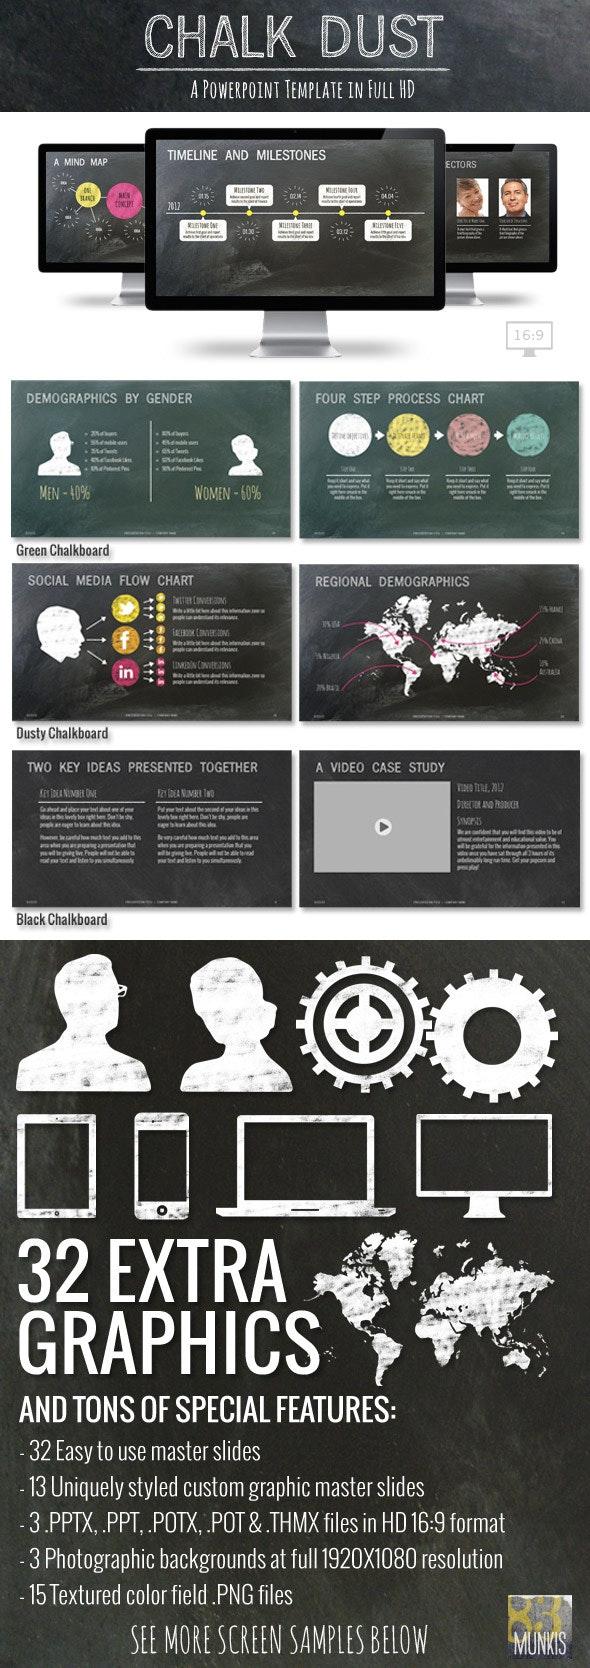 Chalk Dust Powerpoint Presentation Template - PowerPoint Templates Presentation Templates